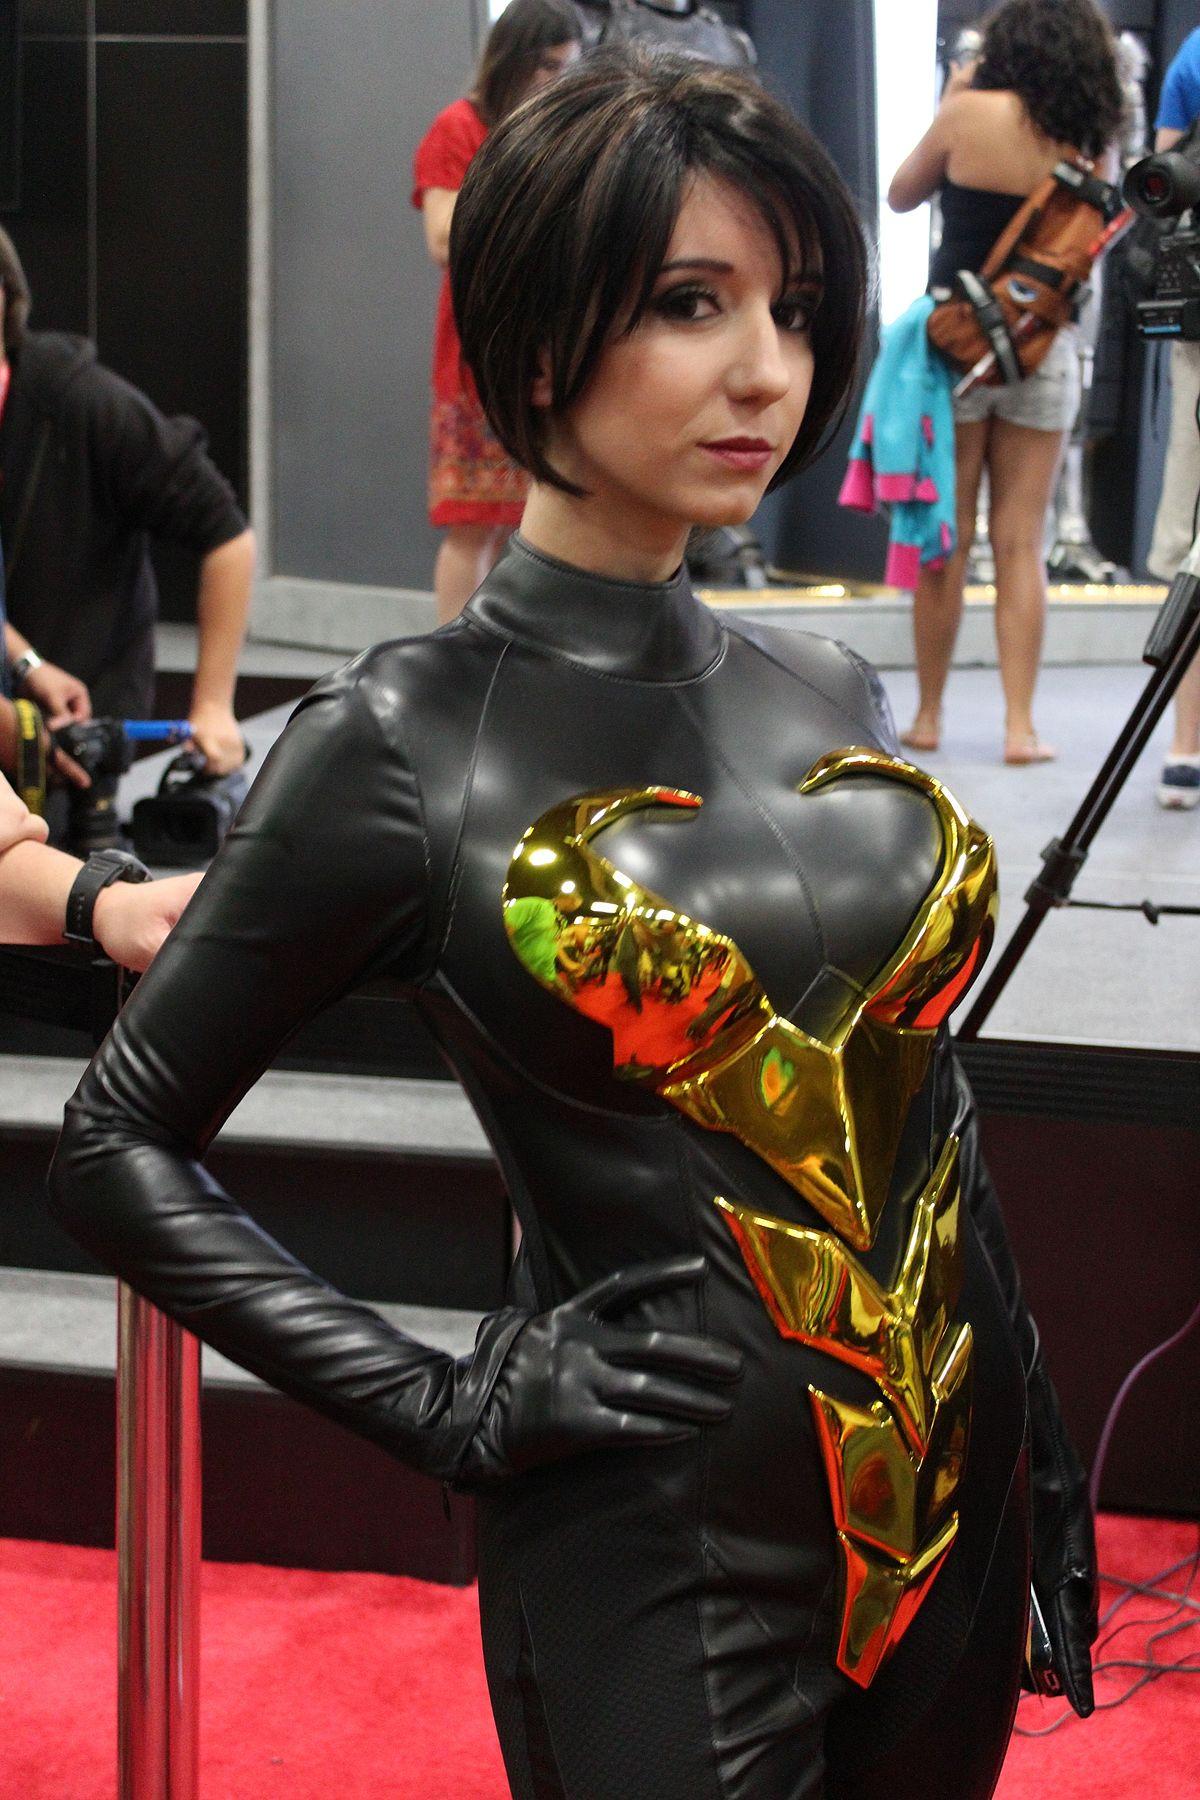 Gu pe marvel comics wikip dia - Super heros fille marvel ...